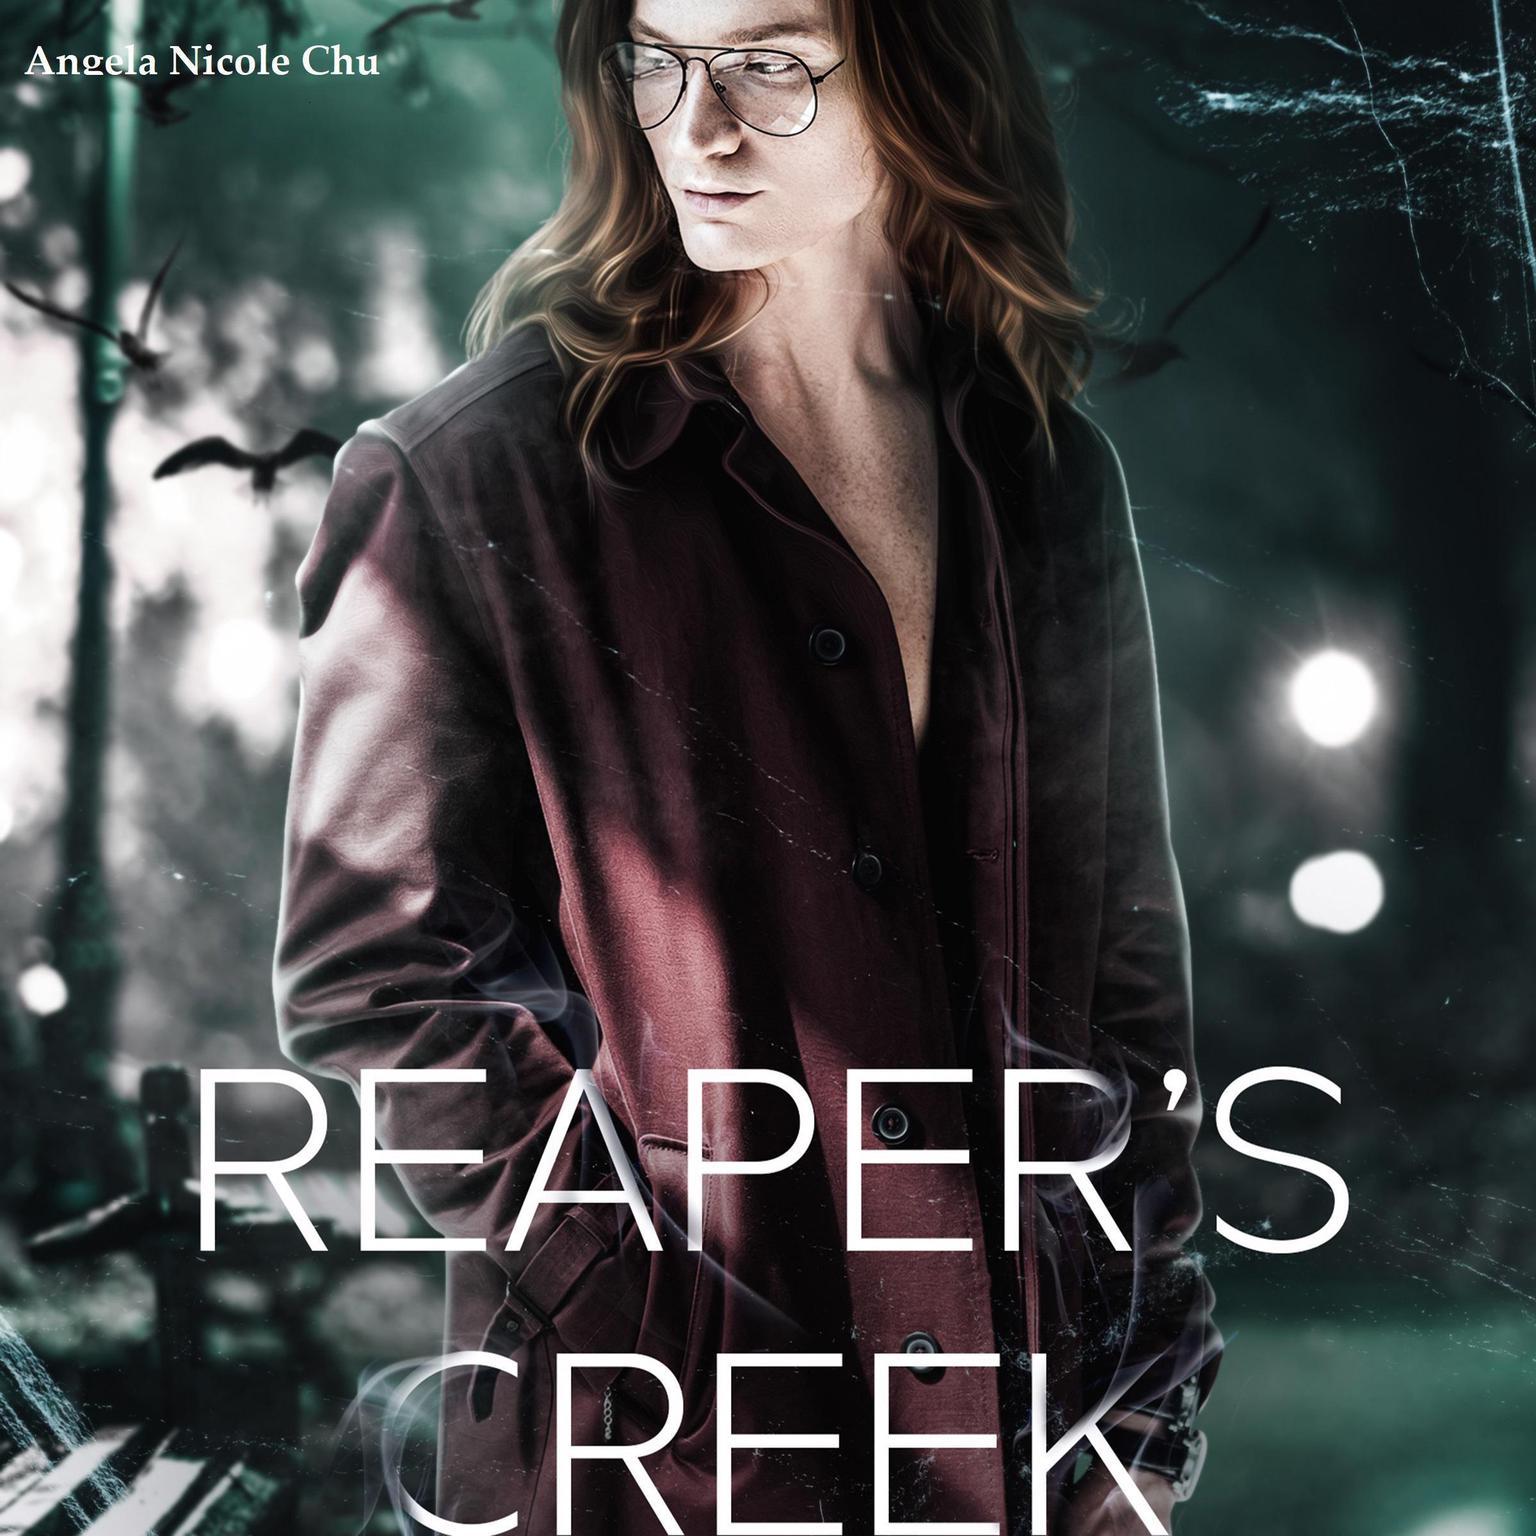 Reapers Creek Audiobook, by Angela Nicole Chu